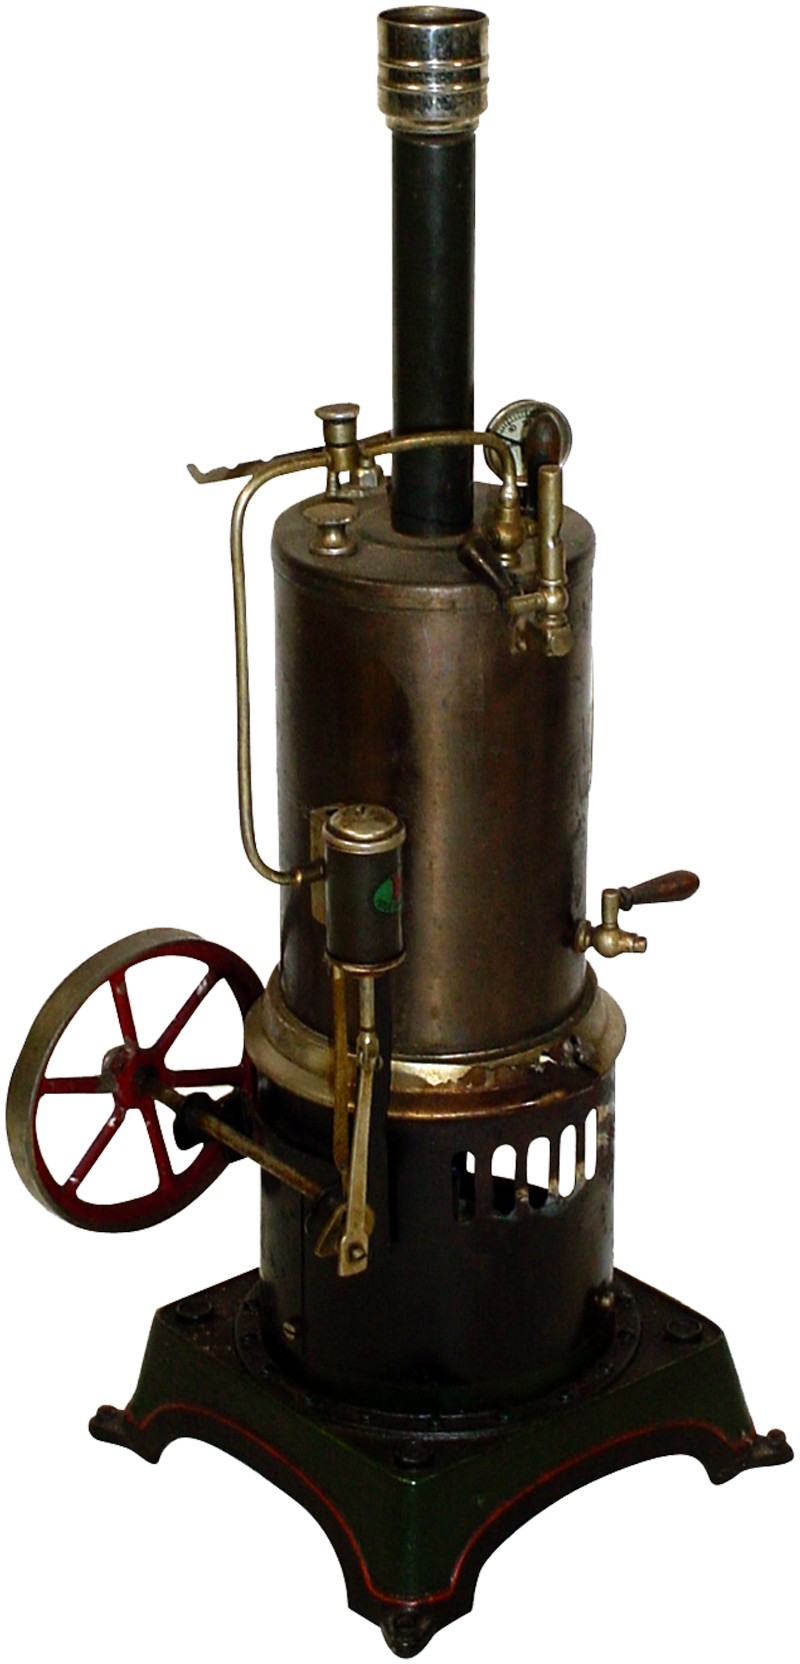 EVD_SteamPunk_Boiler2.png